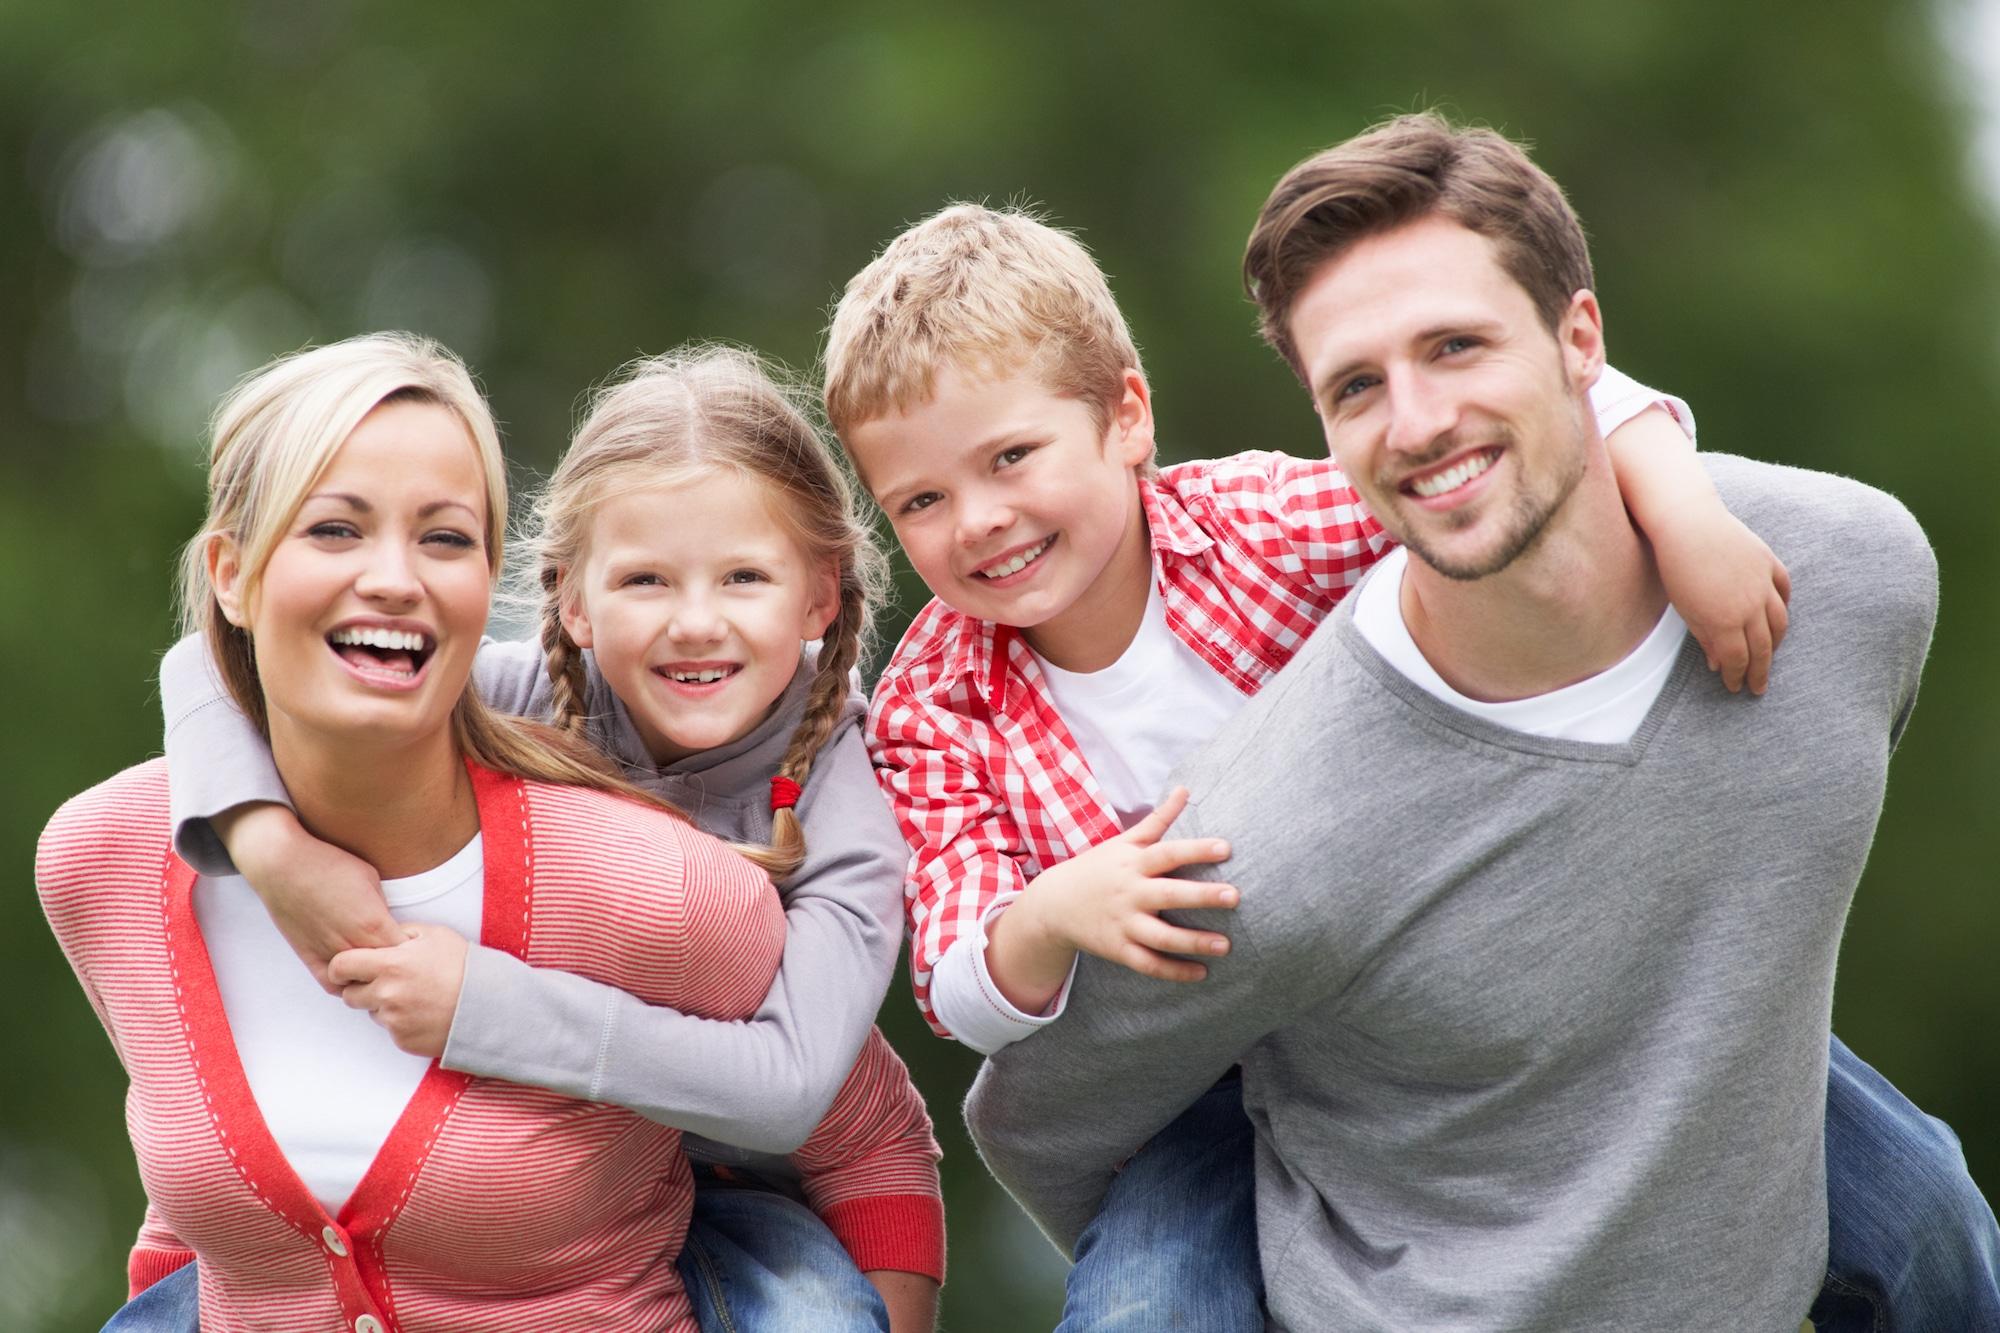 Family Smiling 2000